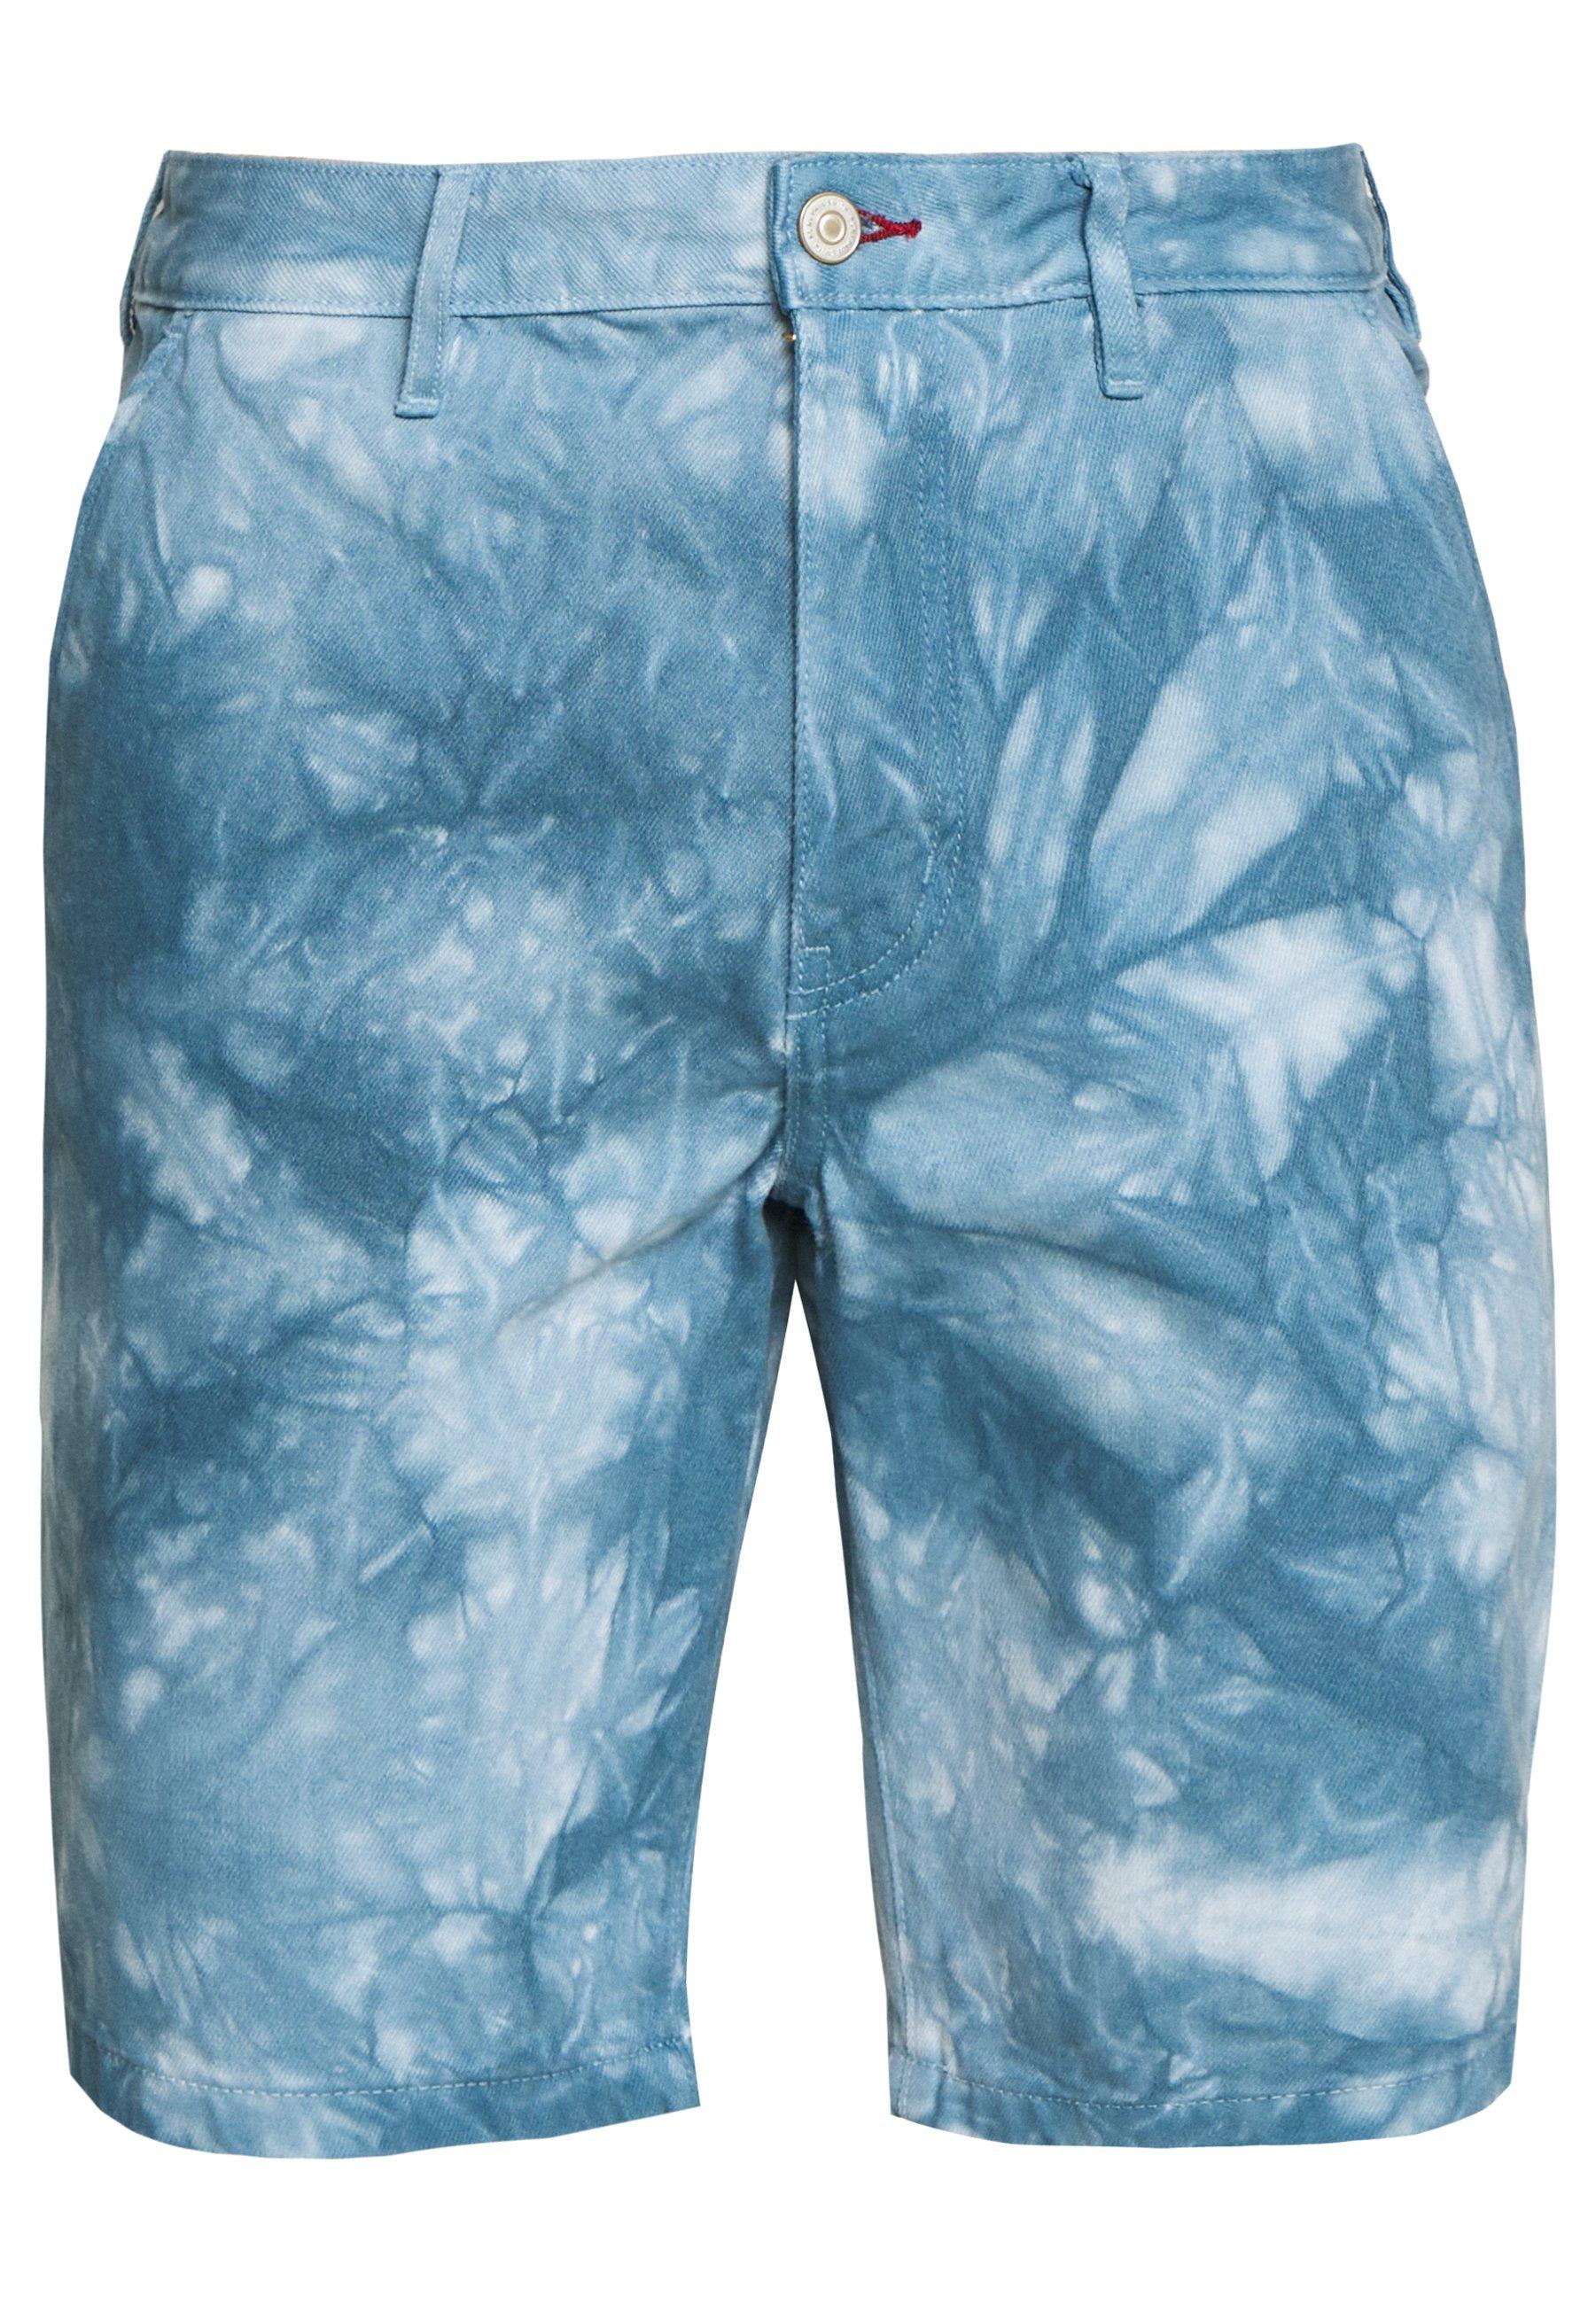 Ps Paul Smith Mens Standard Fit - Jeansshort Light Blue Denim